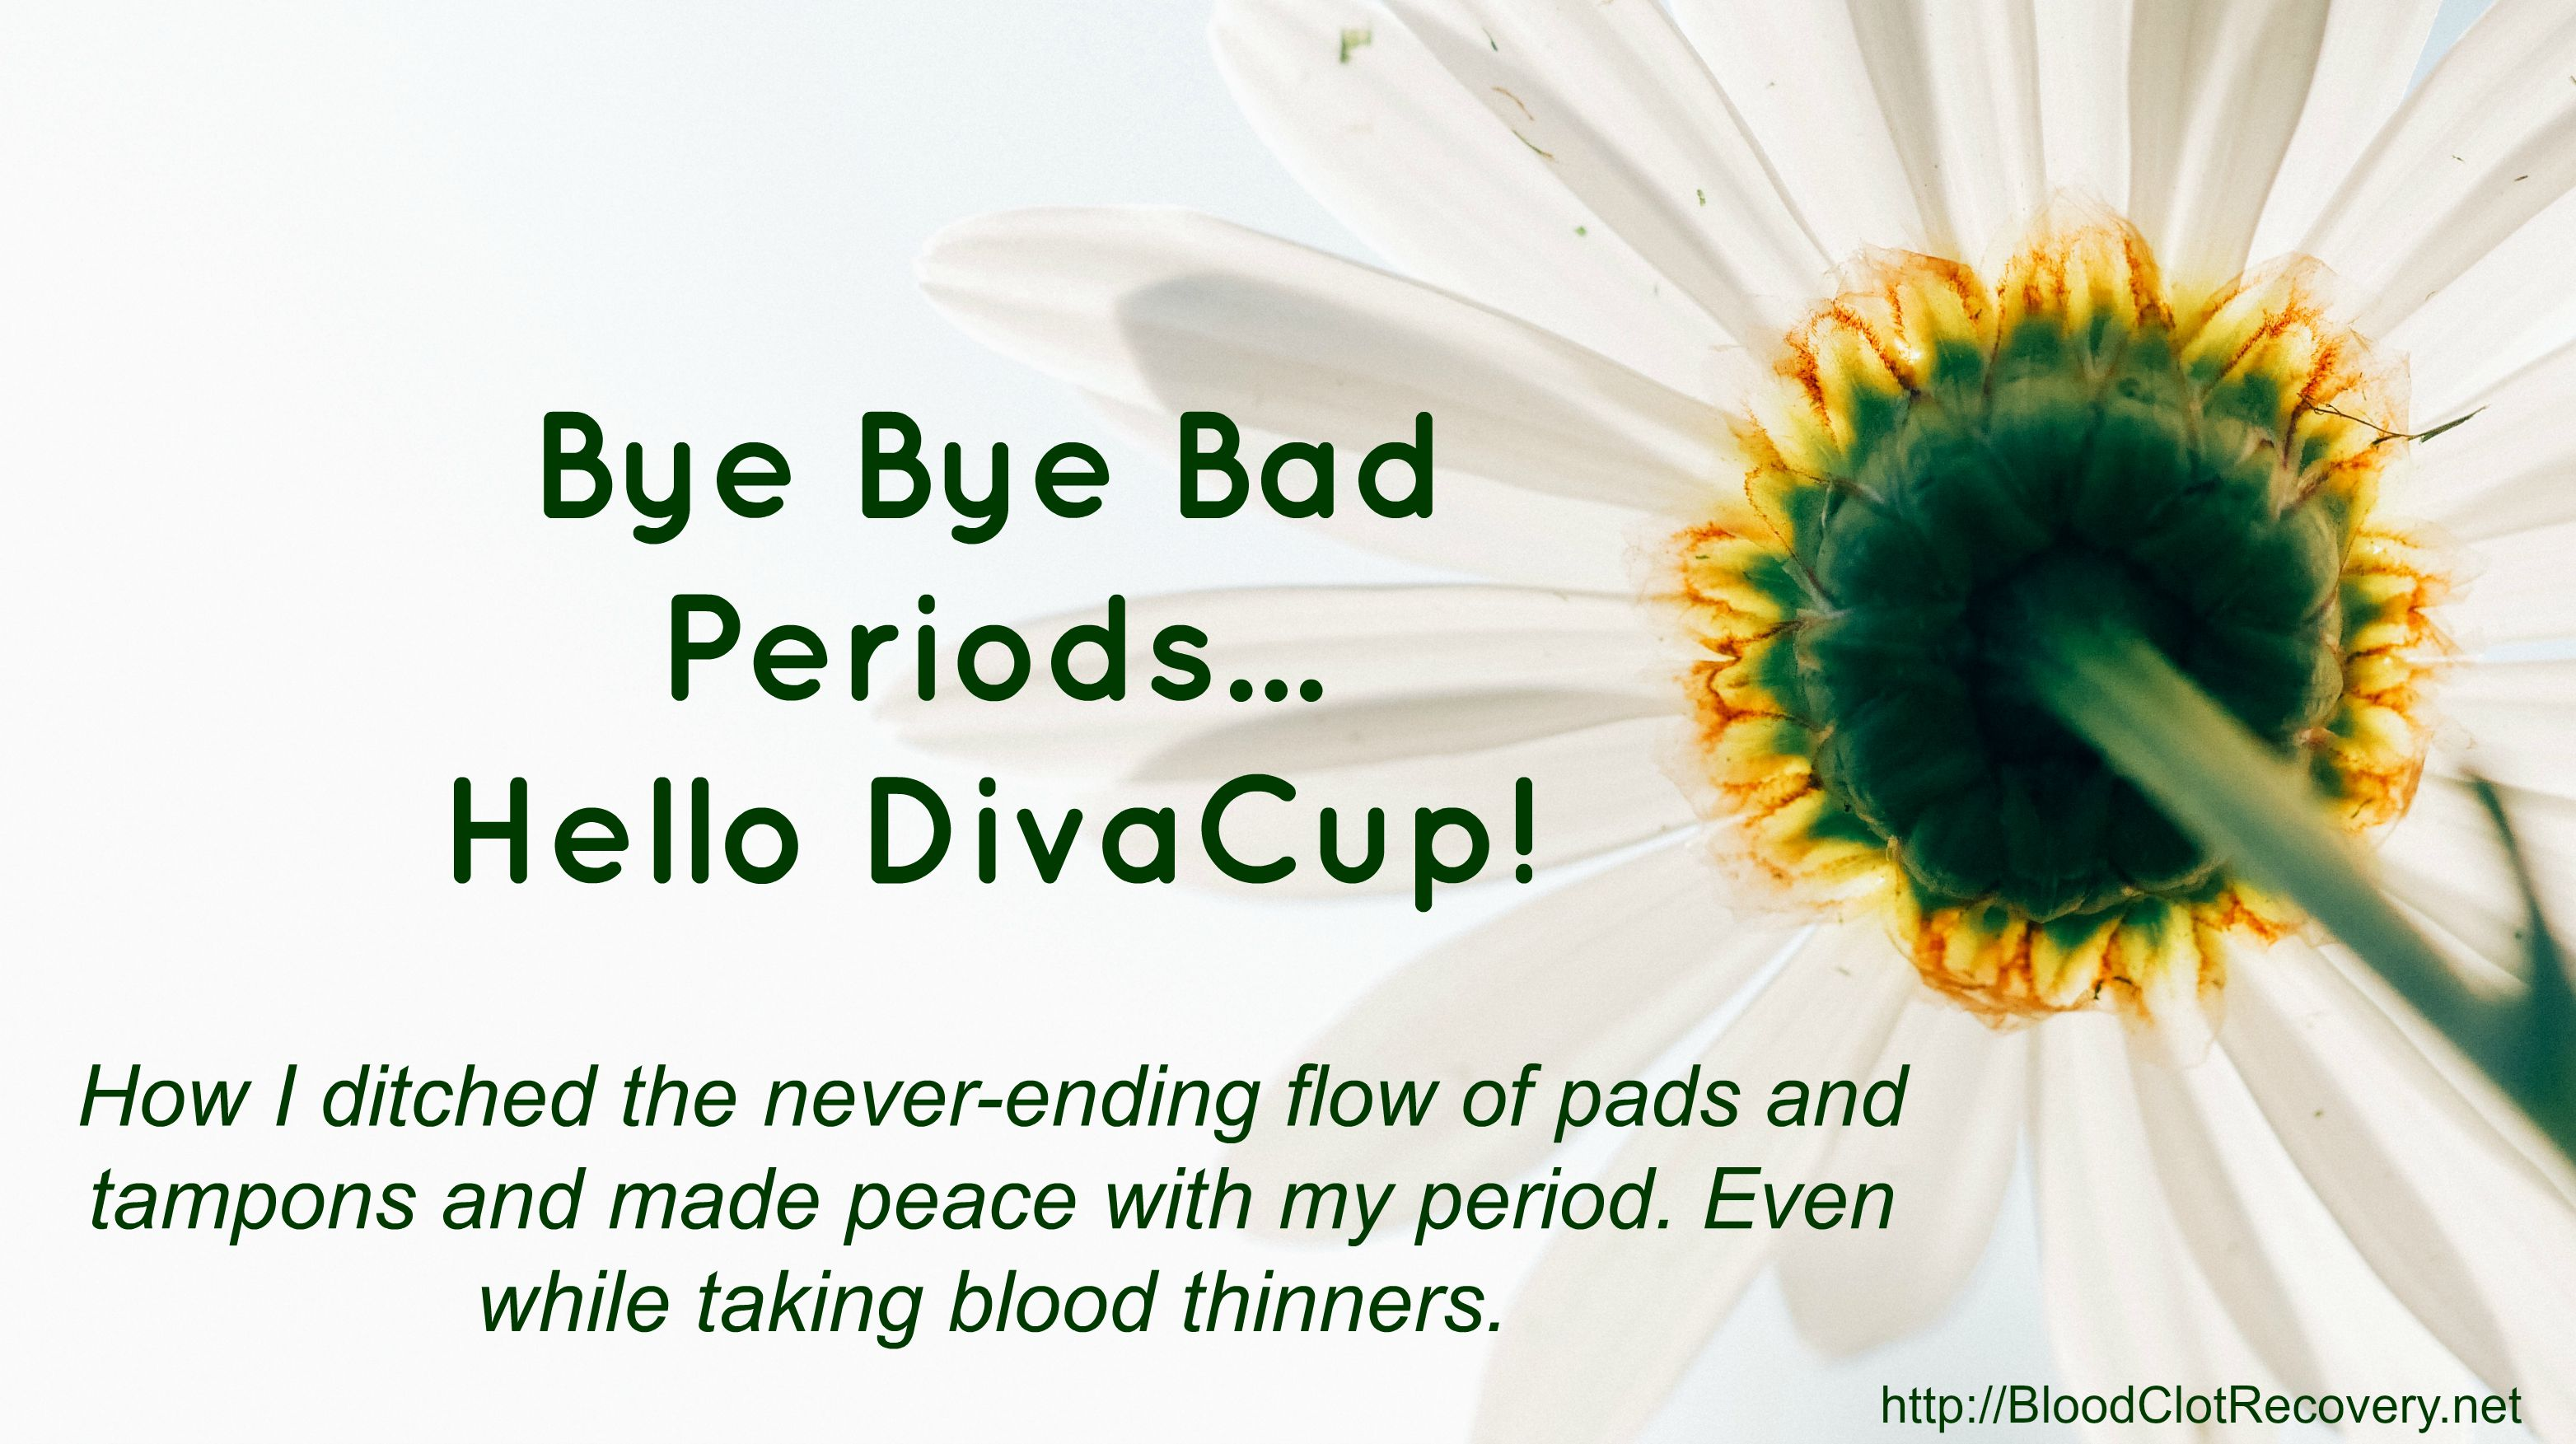 Period Has Been Heavy Divacup